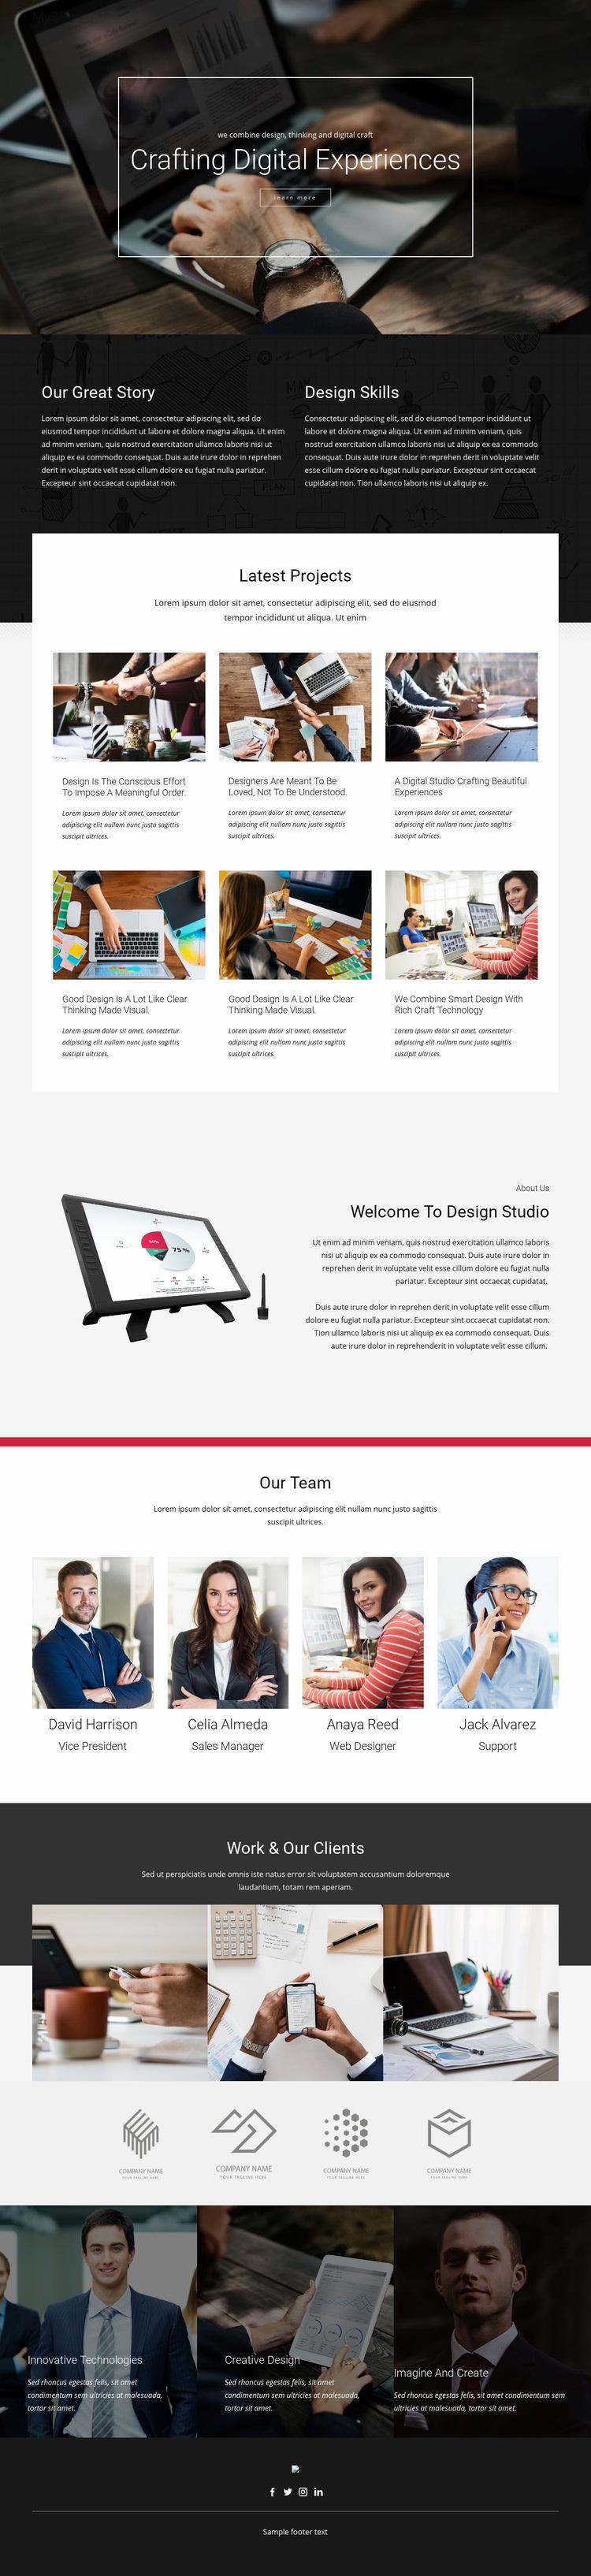 Crafting Digital Design Studio Web Page Design